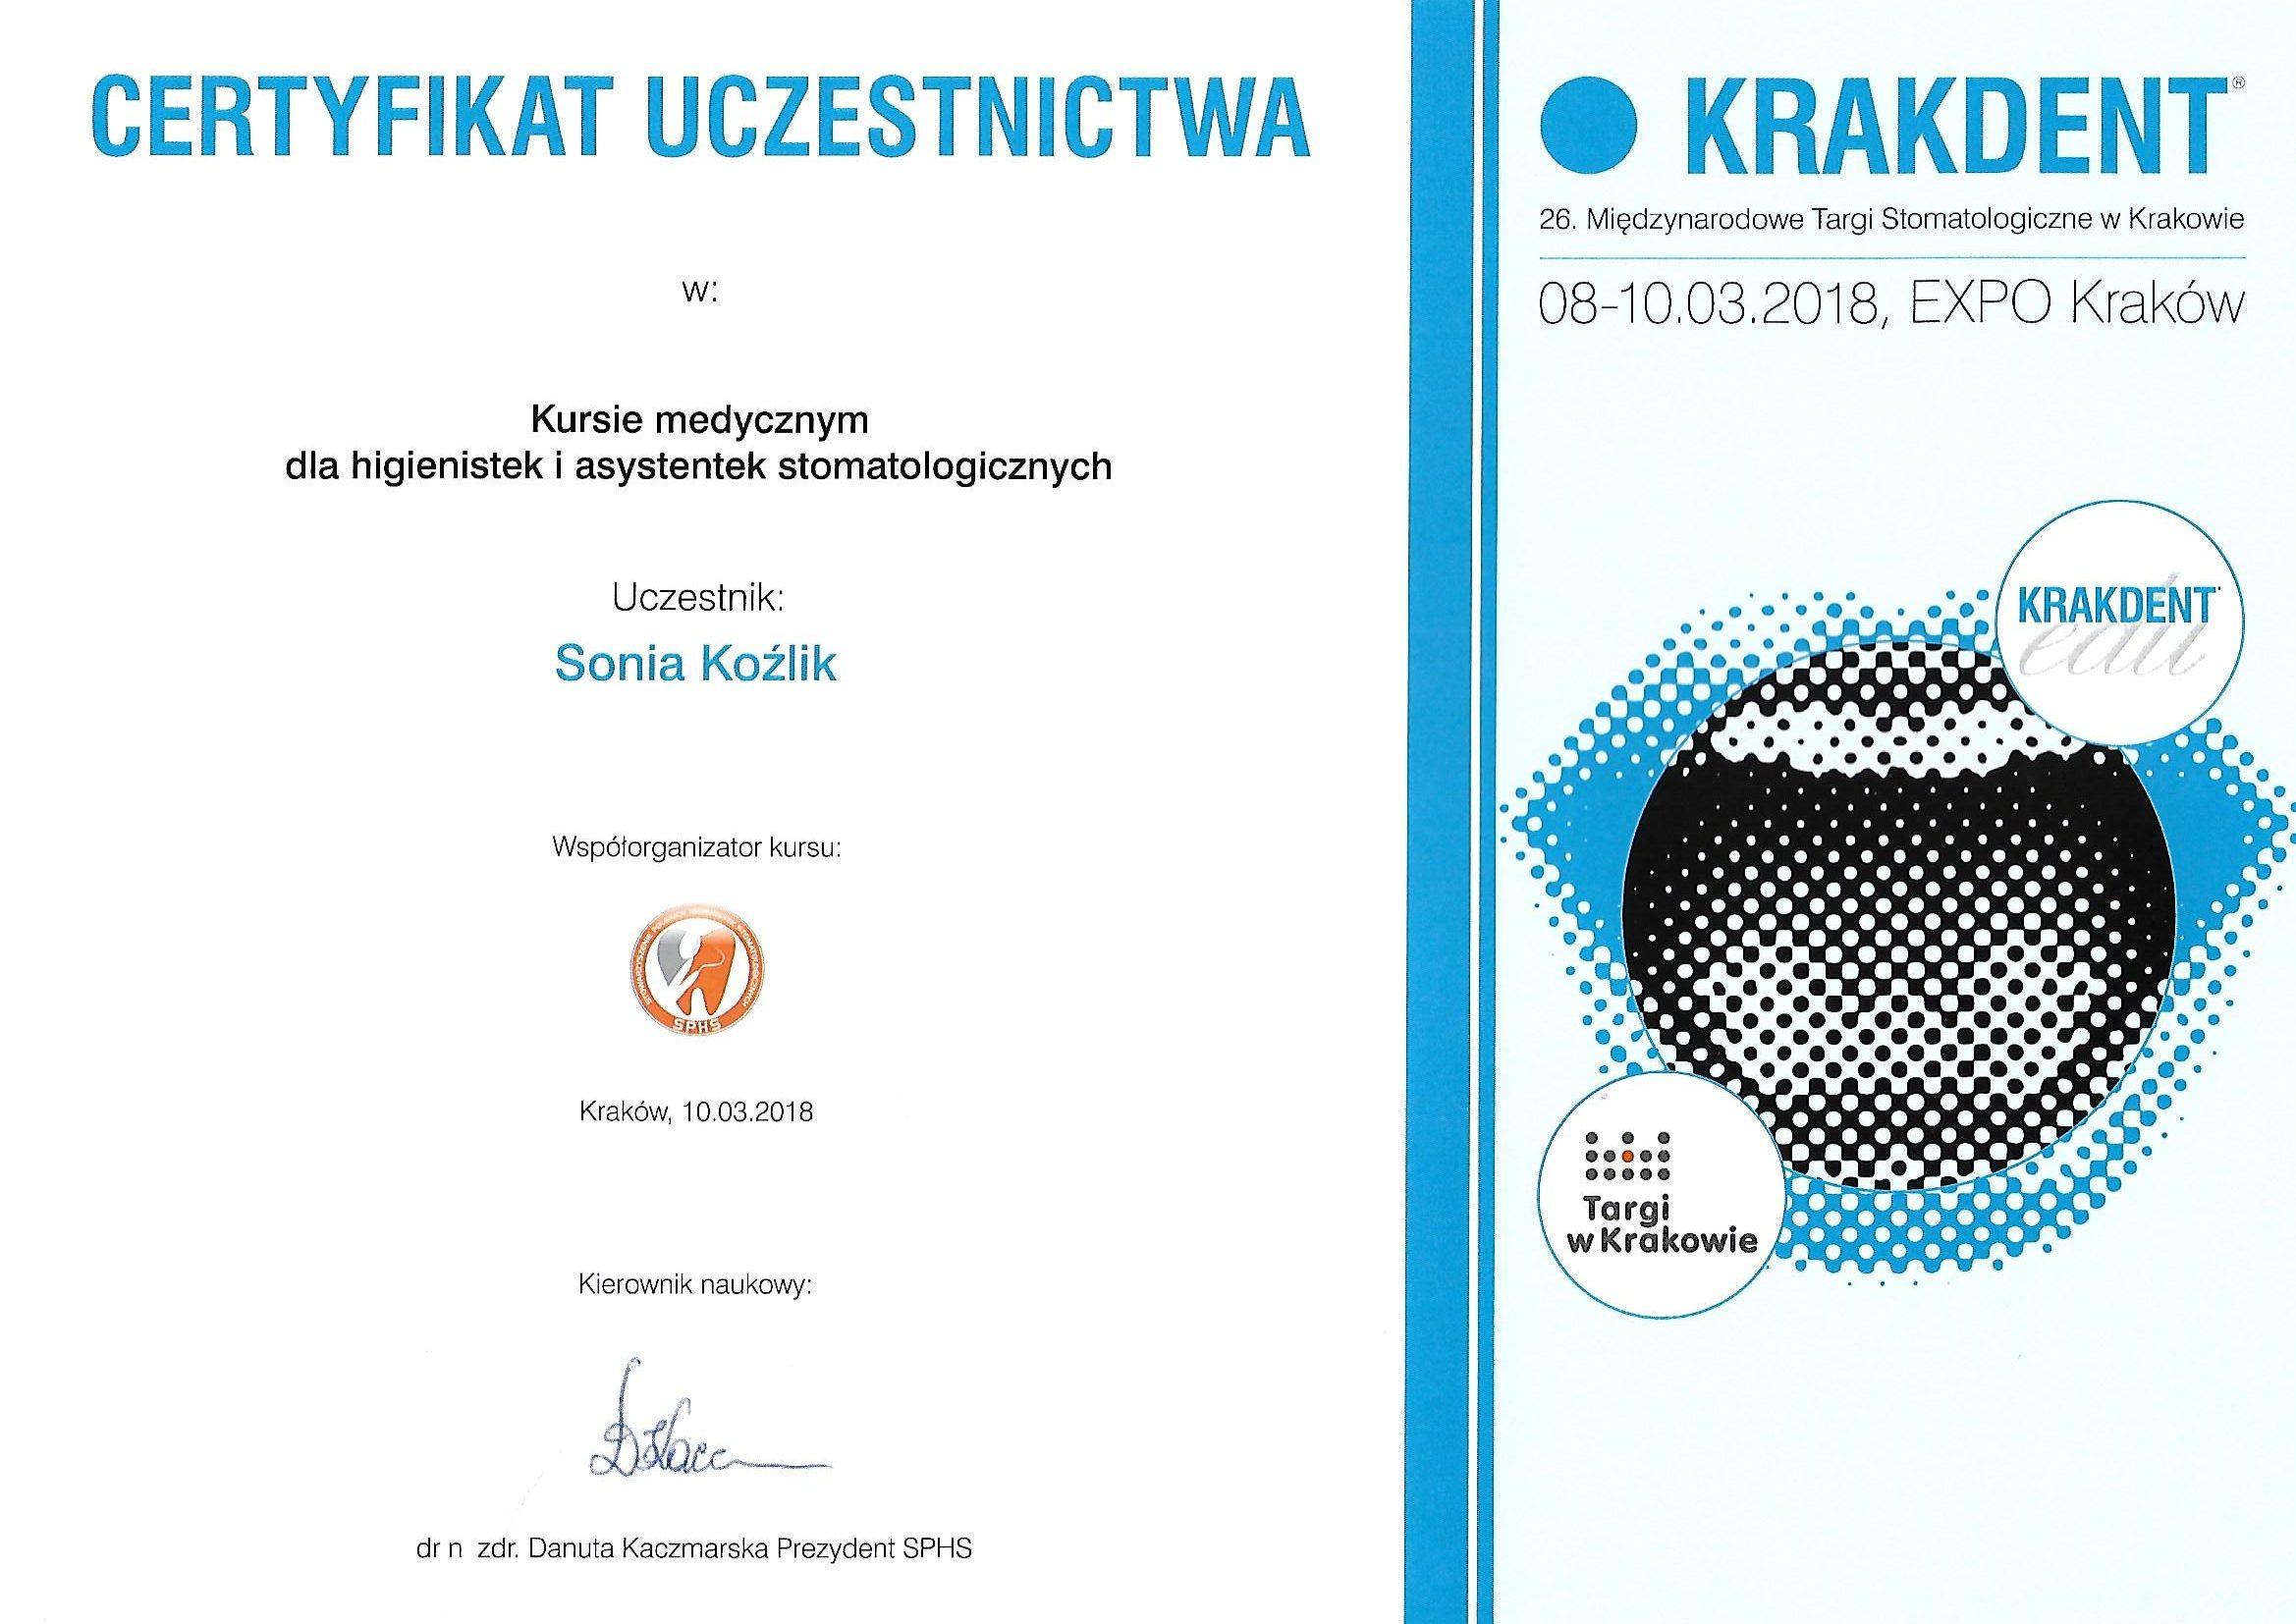 certyfikat sonia kozlik krakdent